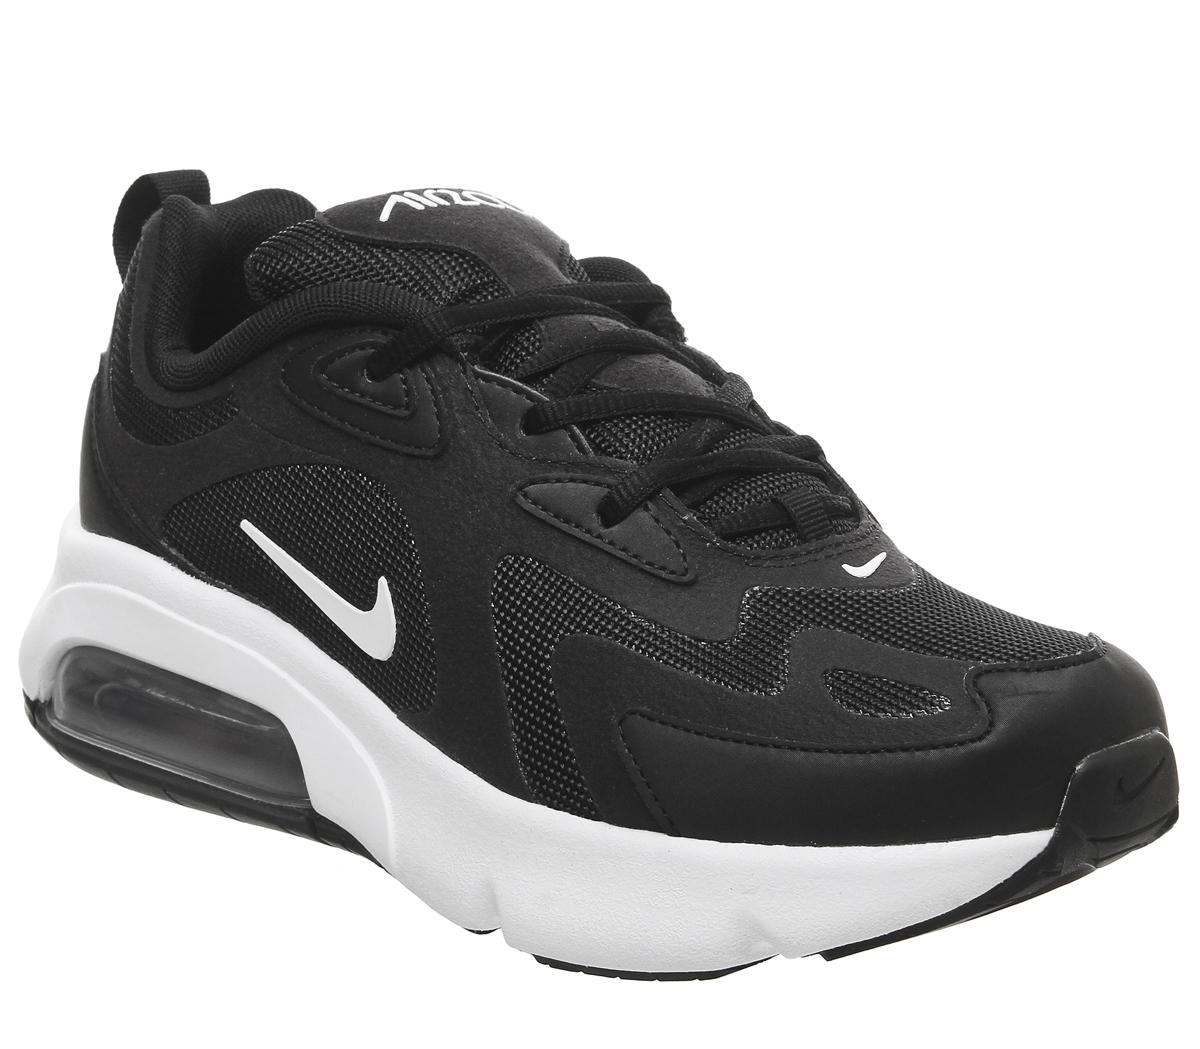 nike air max 200 black and white